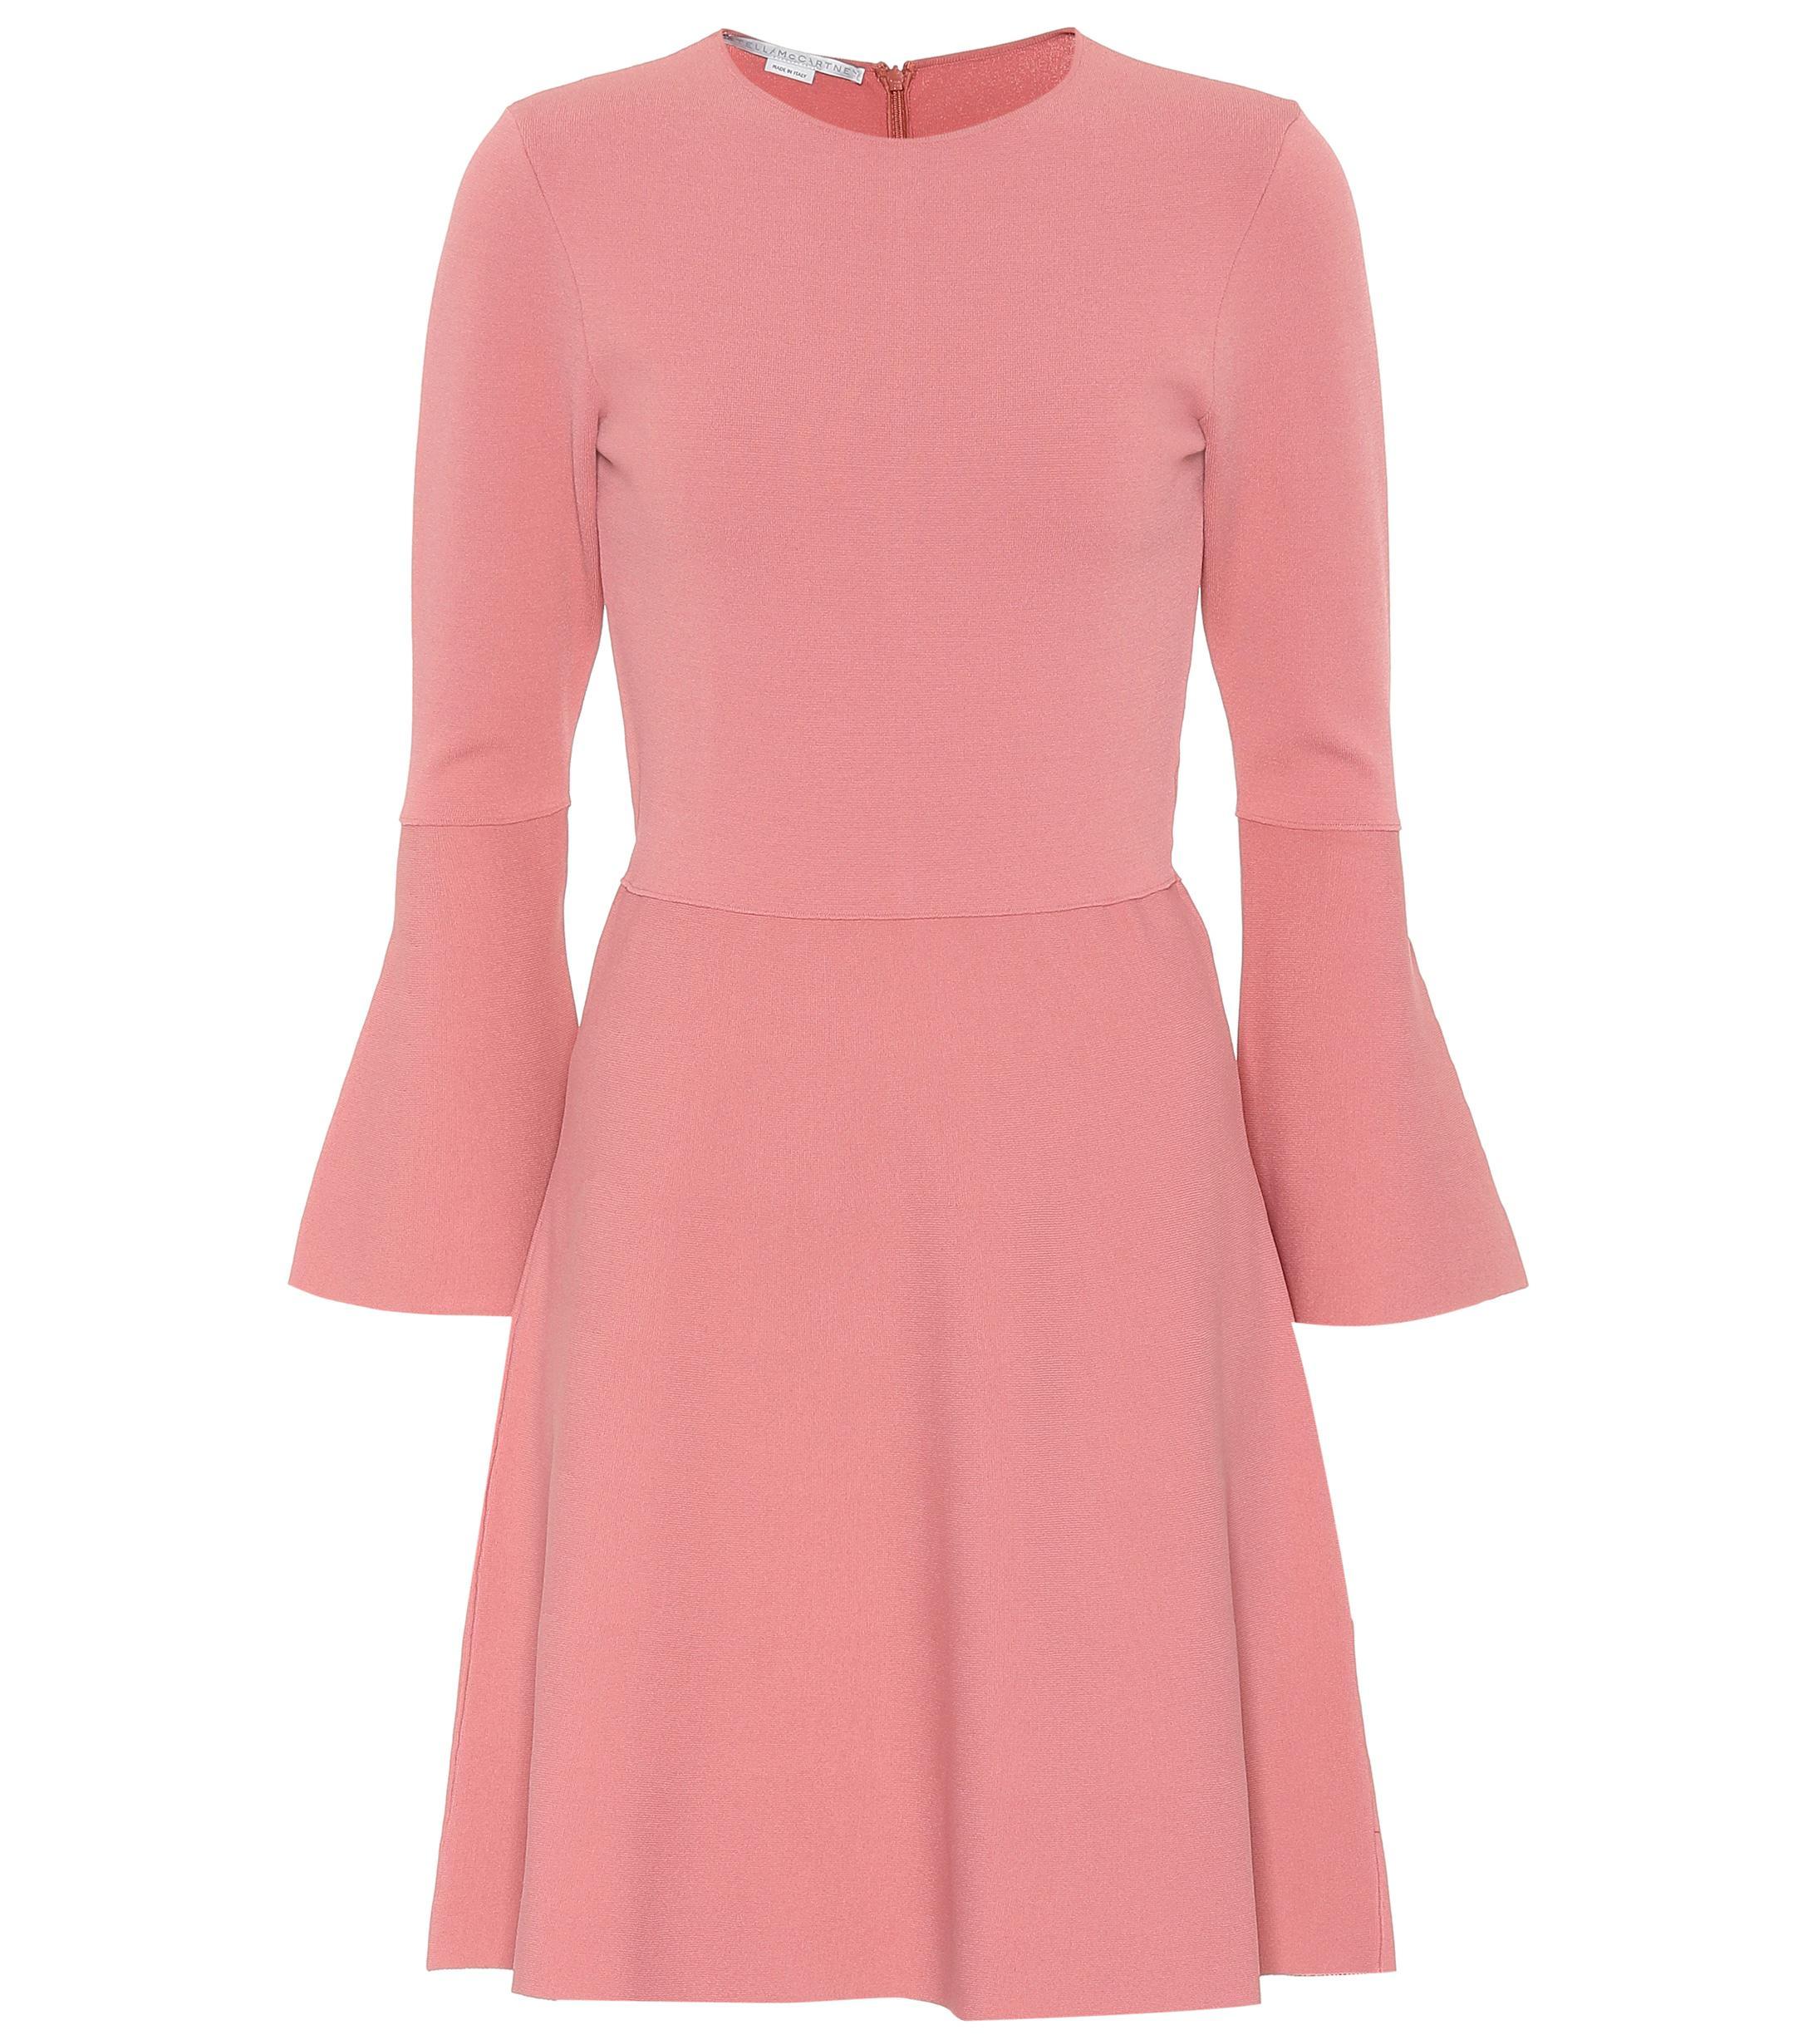 Lyst - Mini-robe en crêpe Stella McCartney en coloris Rose 41bcf016d2c